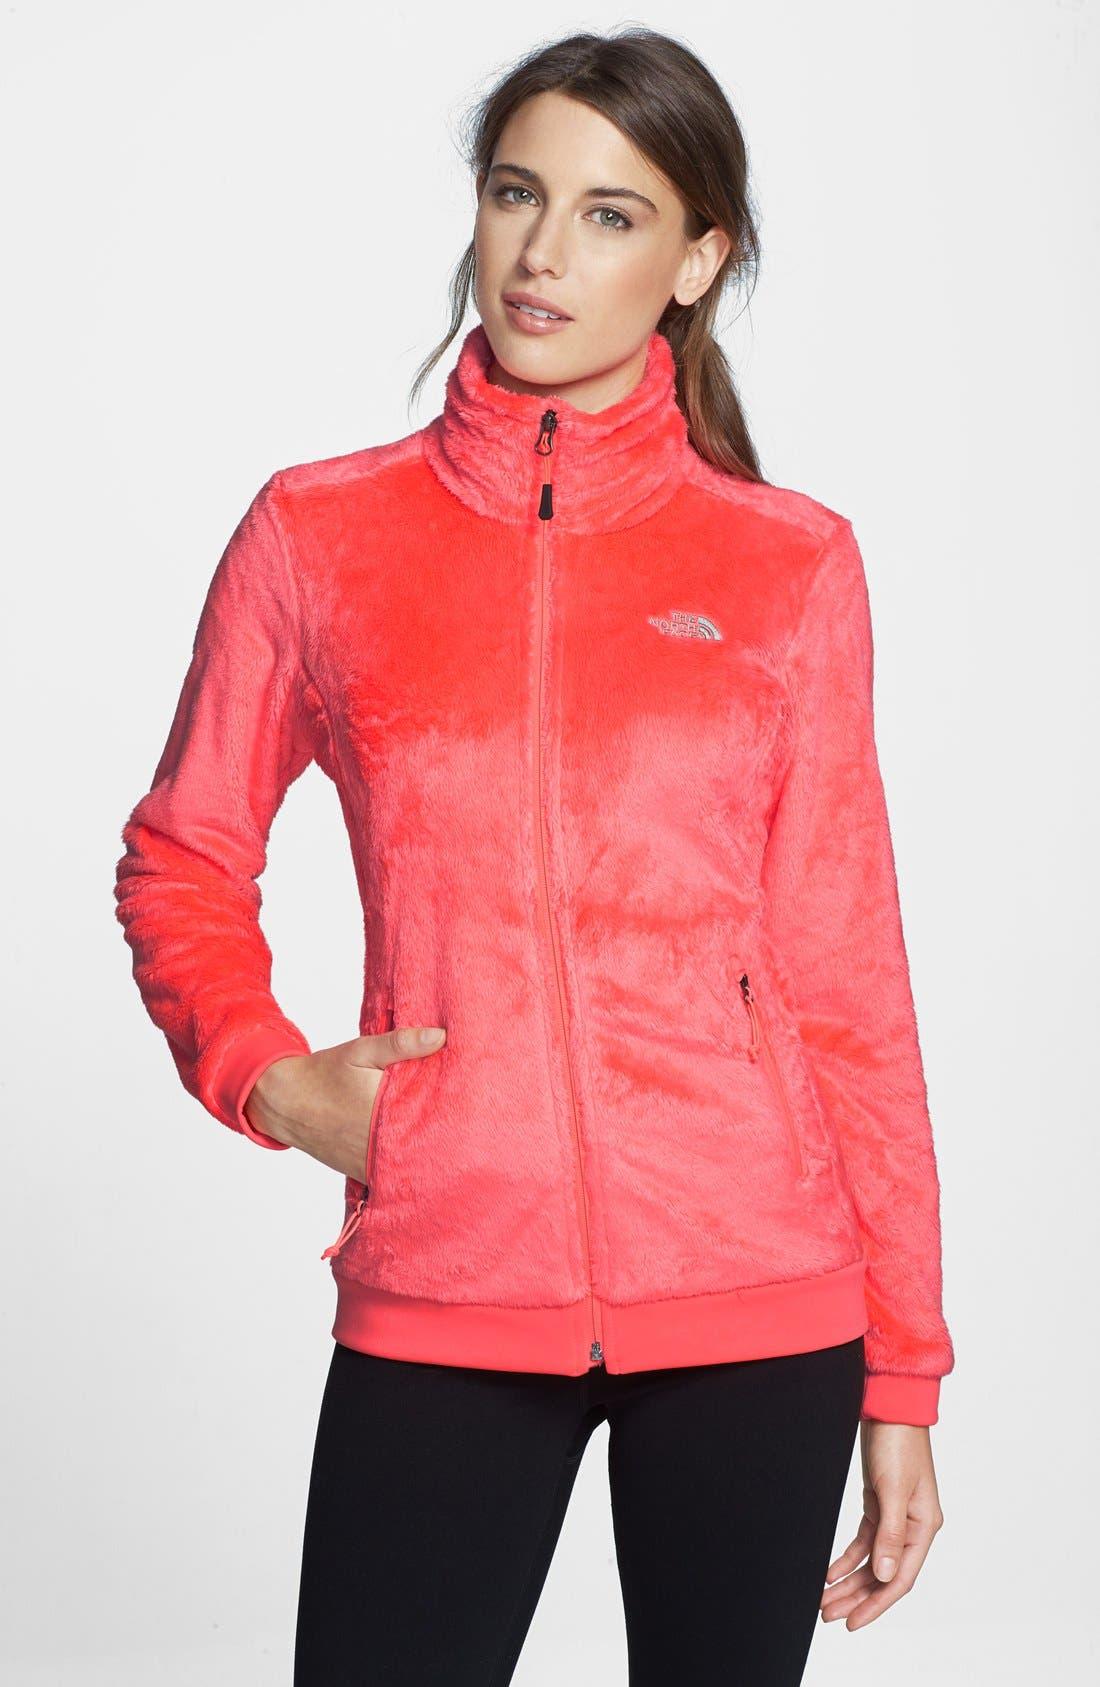 North face women's mod osito jacket